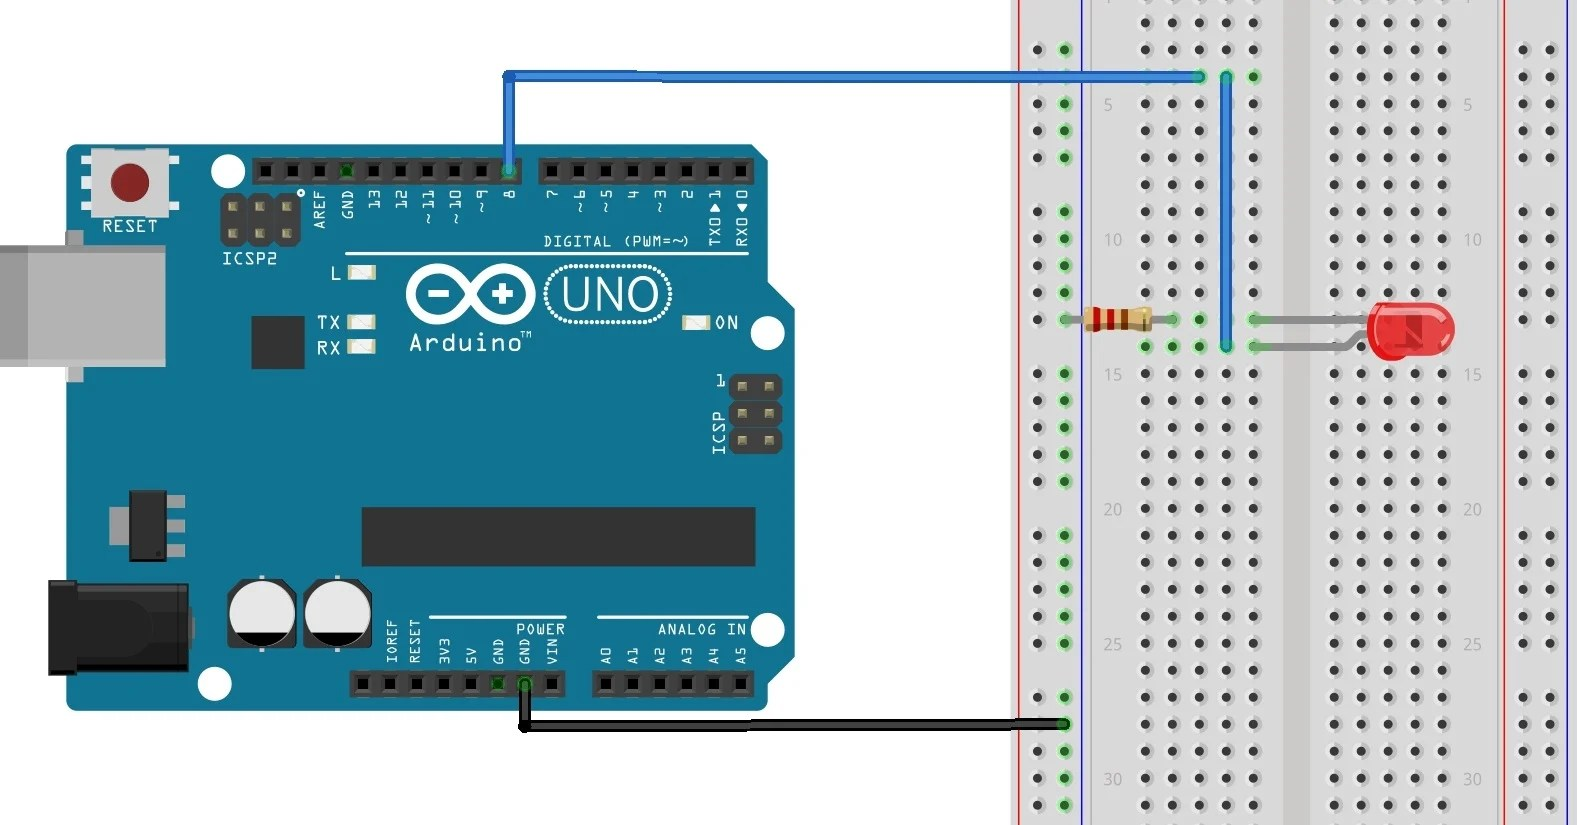 s300 wiring diagram